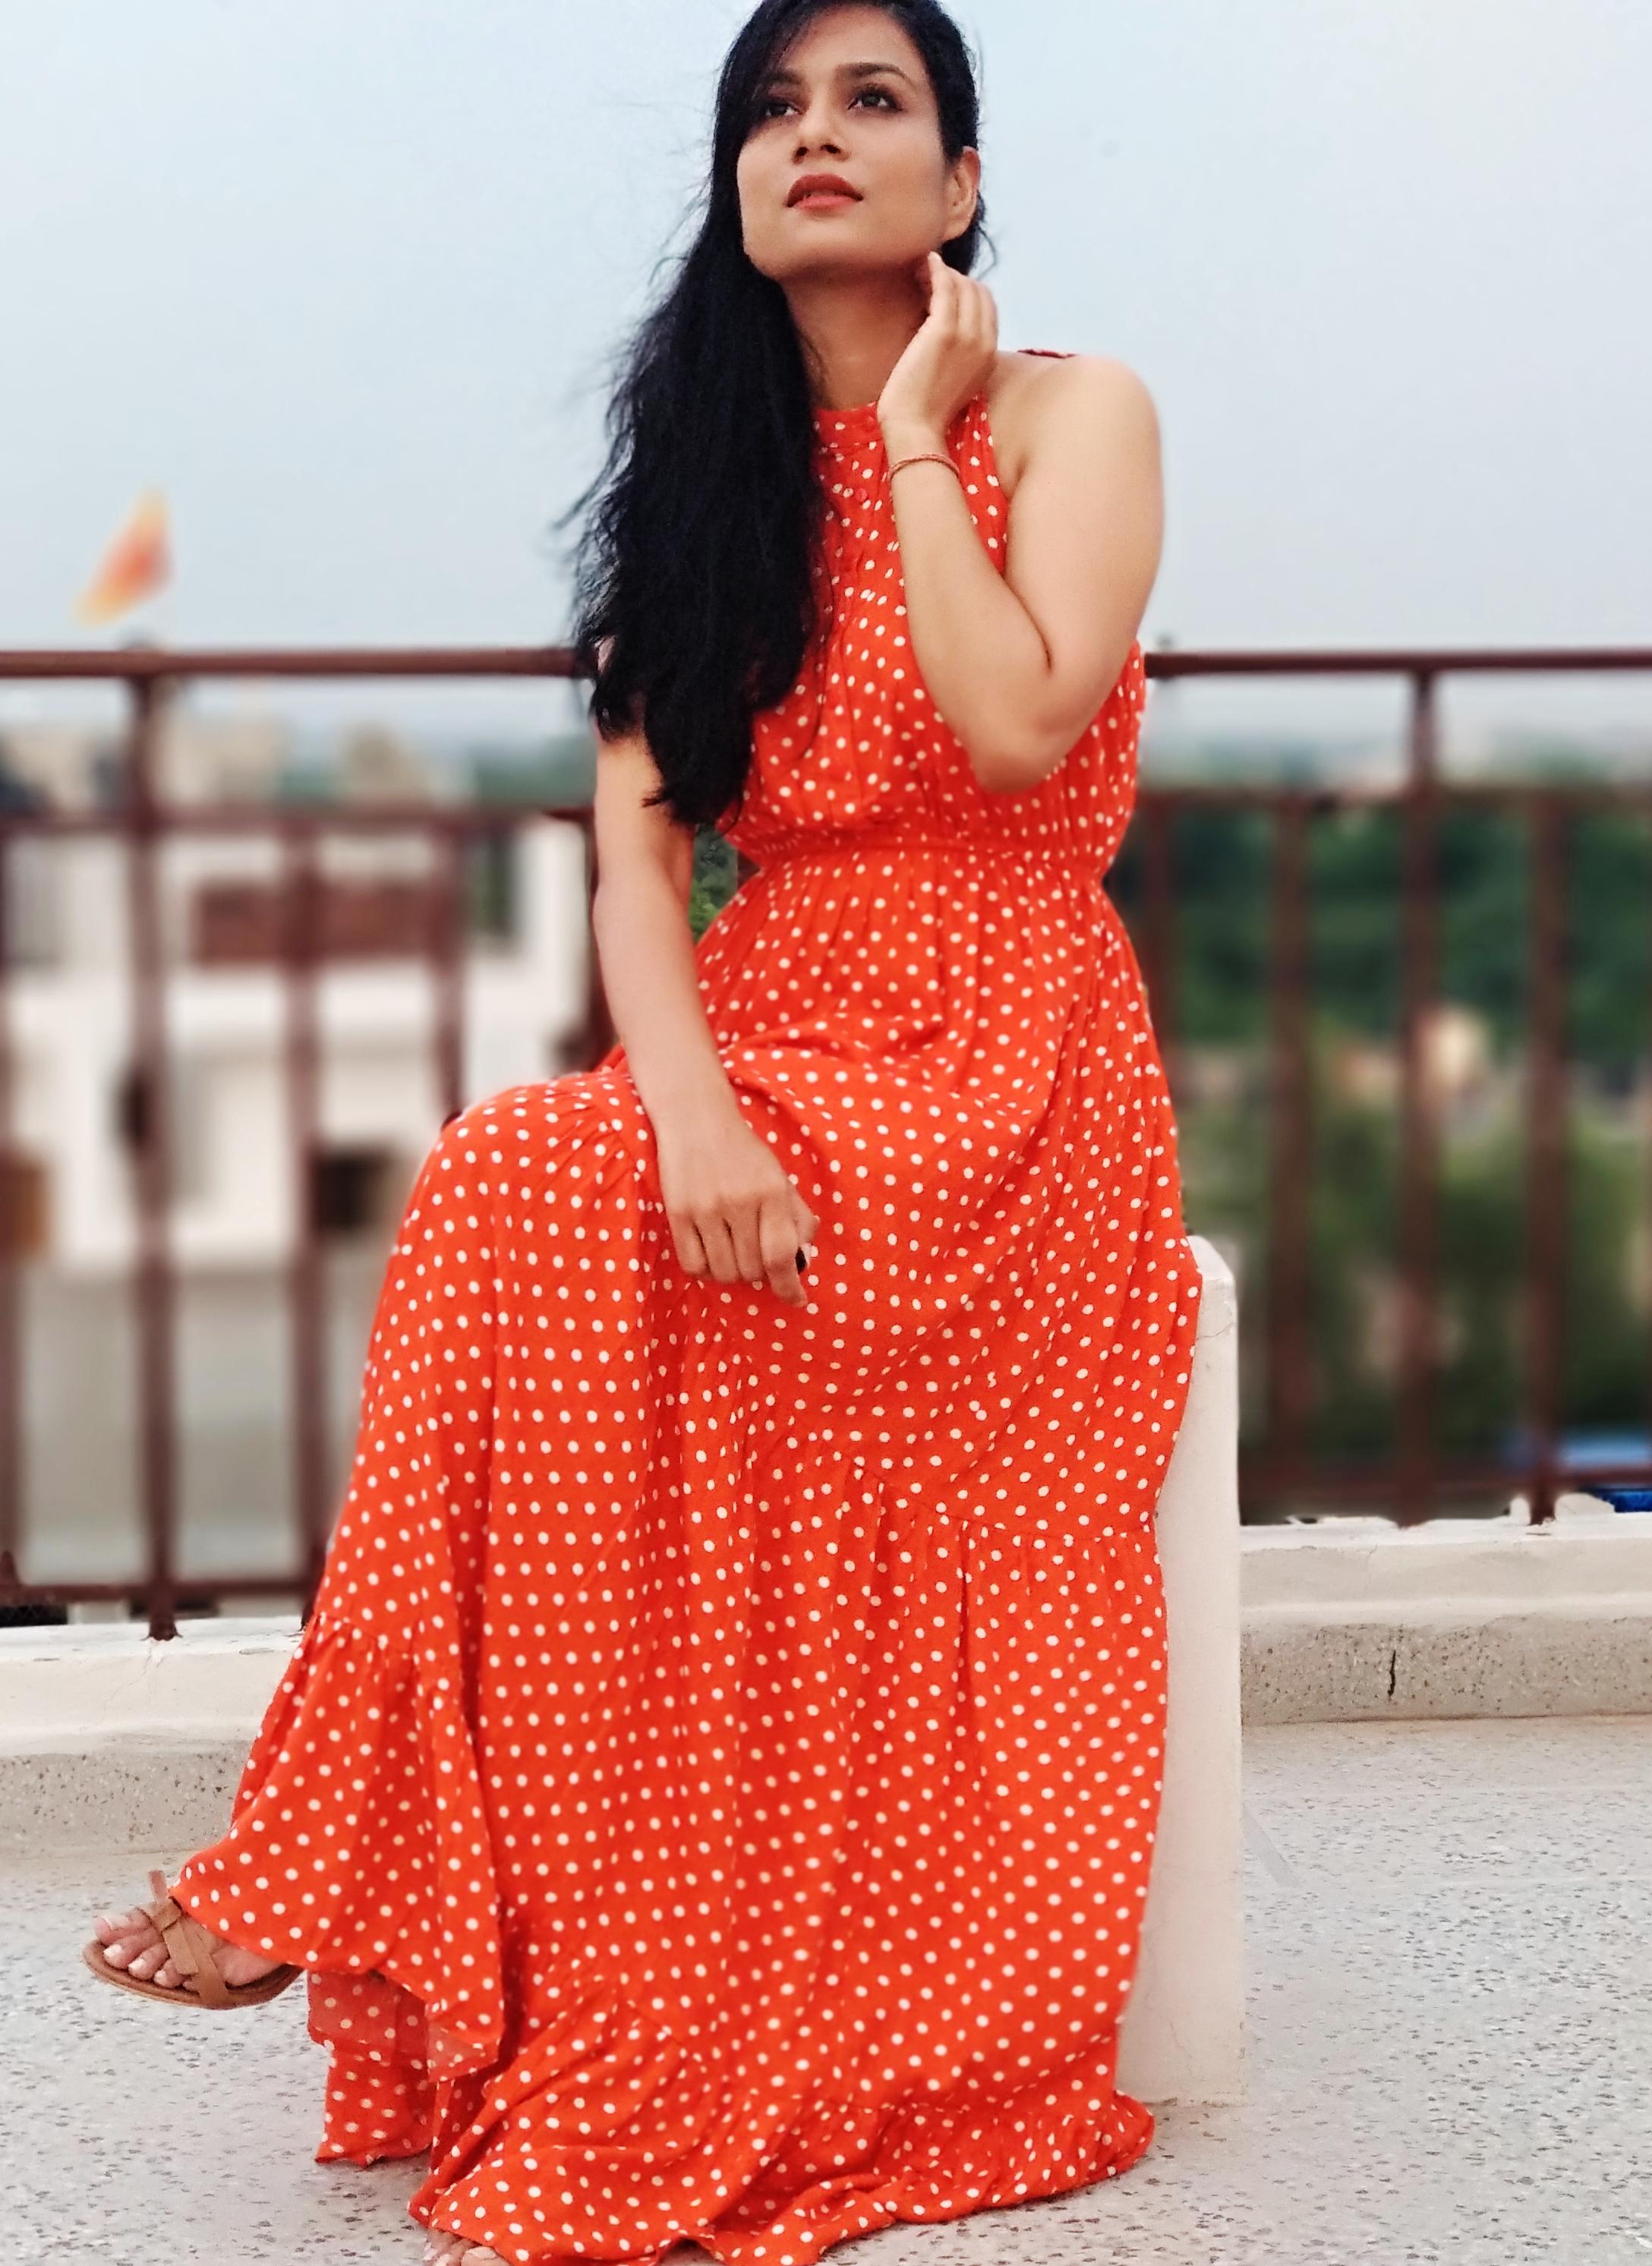 Fall fashion trend polka dot maxi dress